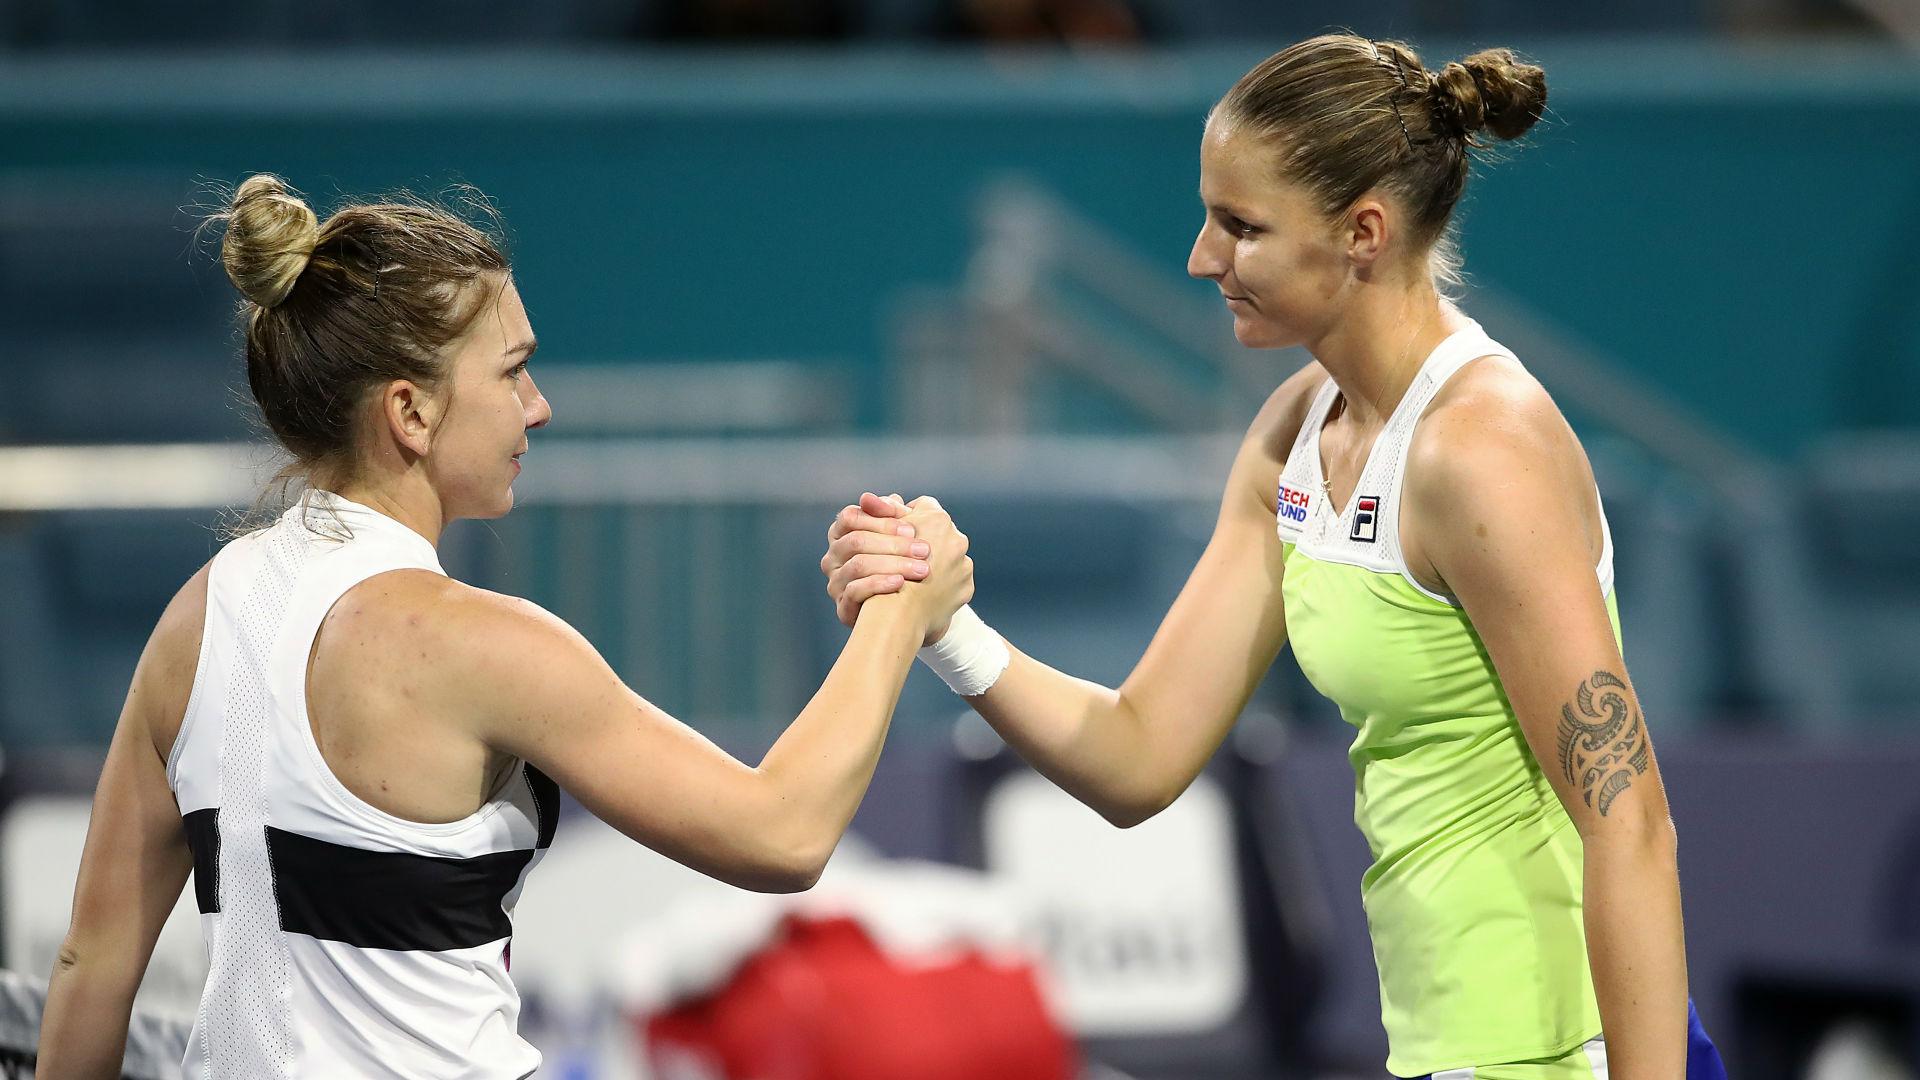 Halep closest to being WTA's Nadal - Pliskova